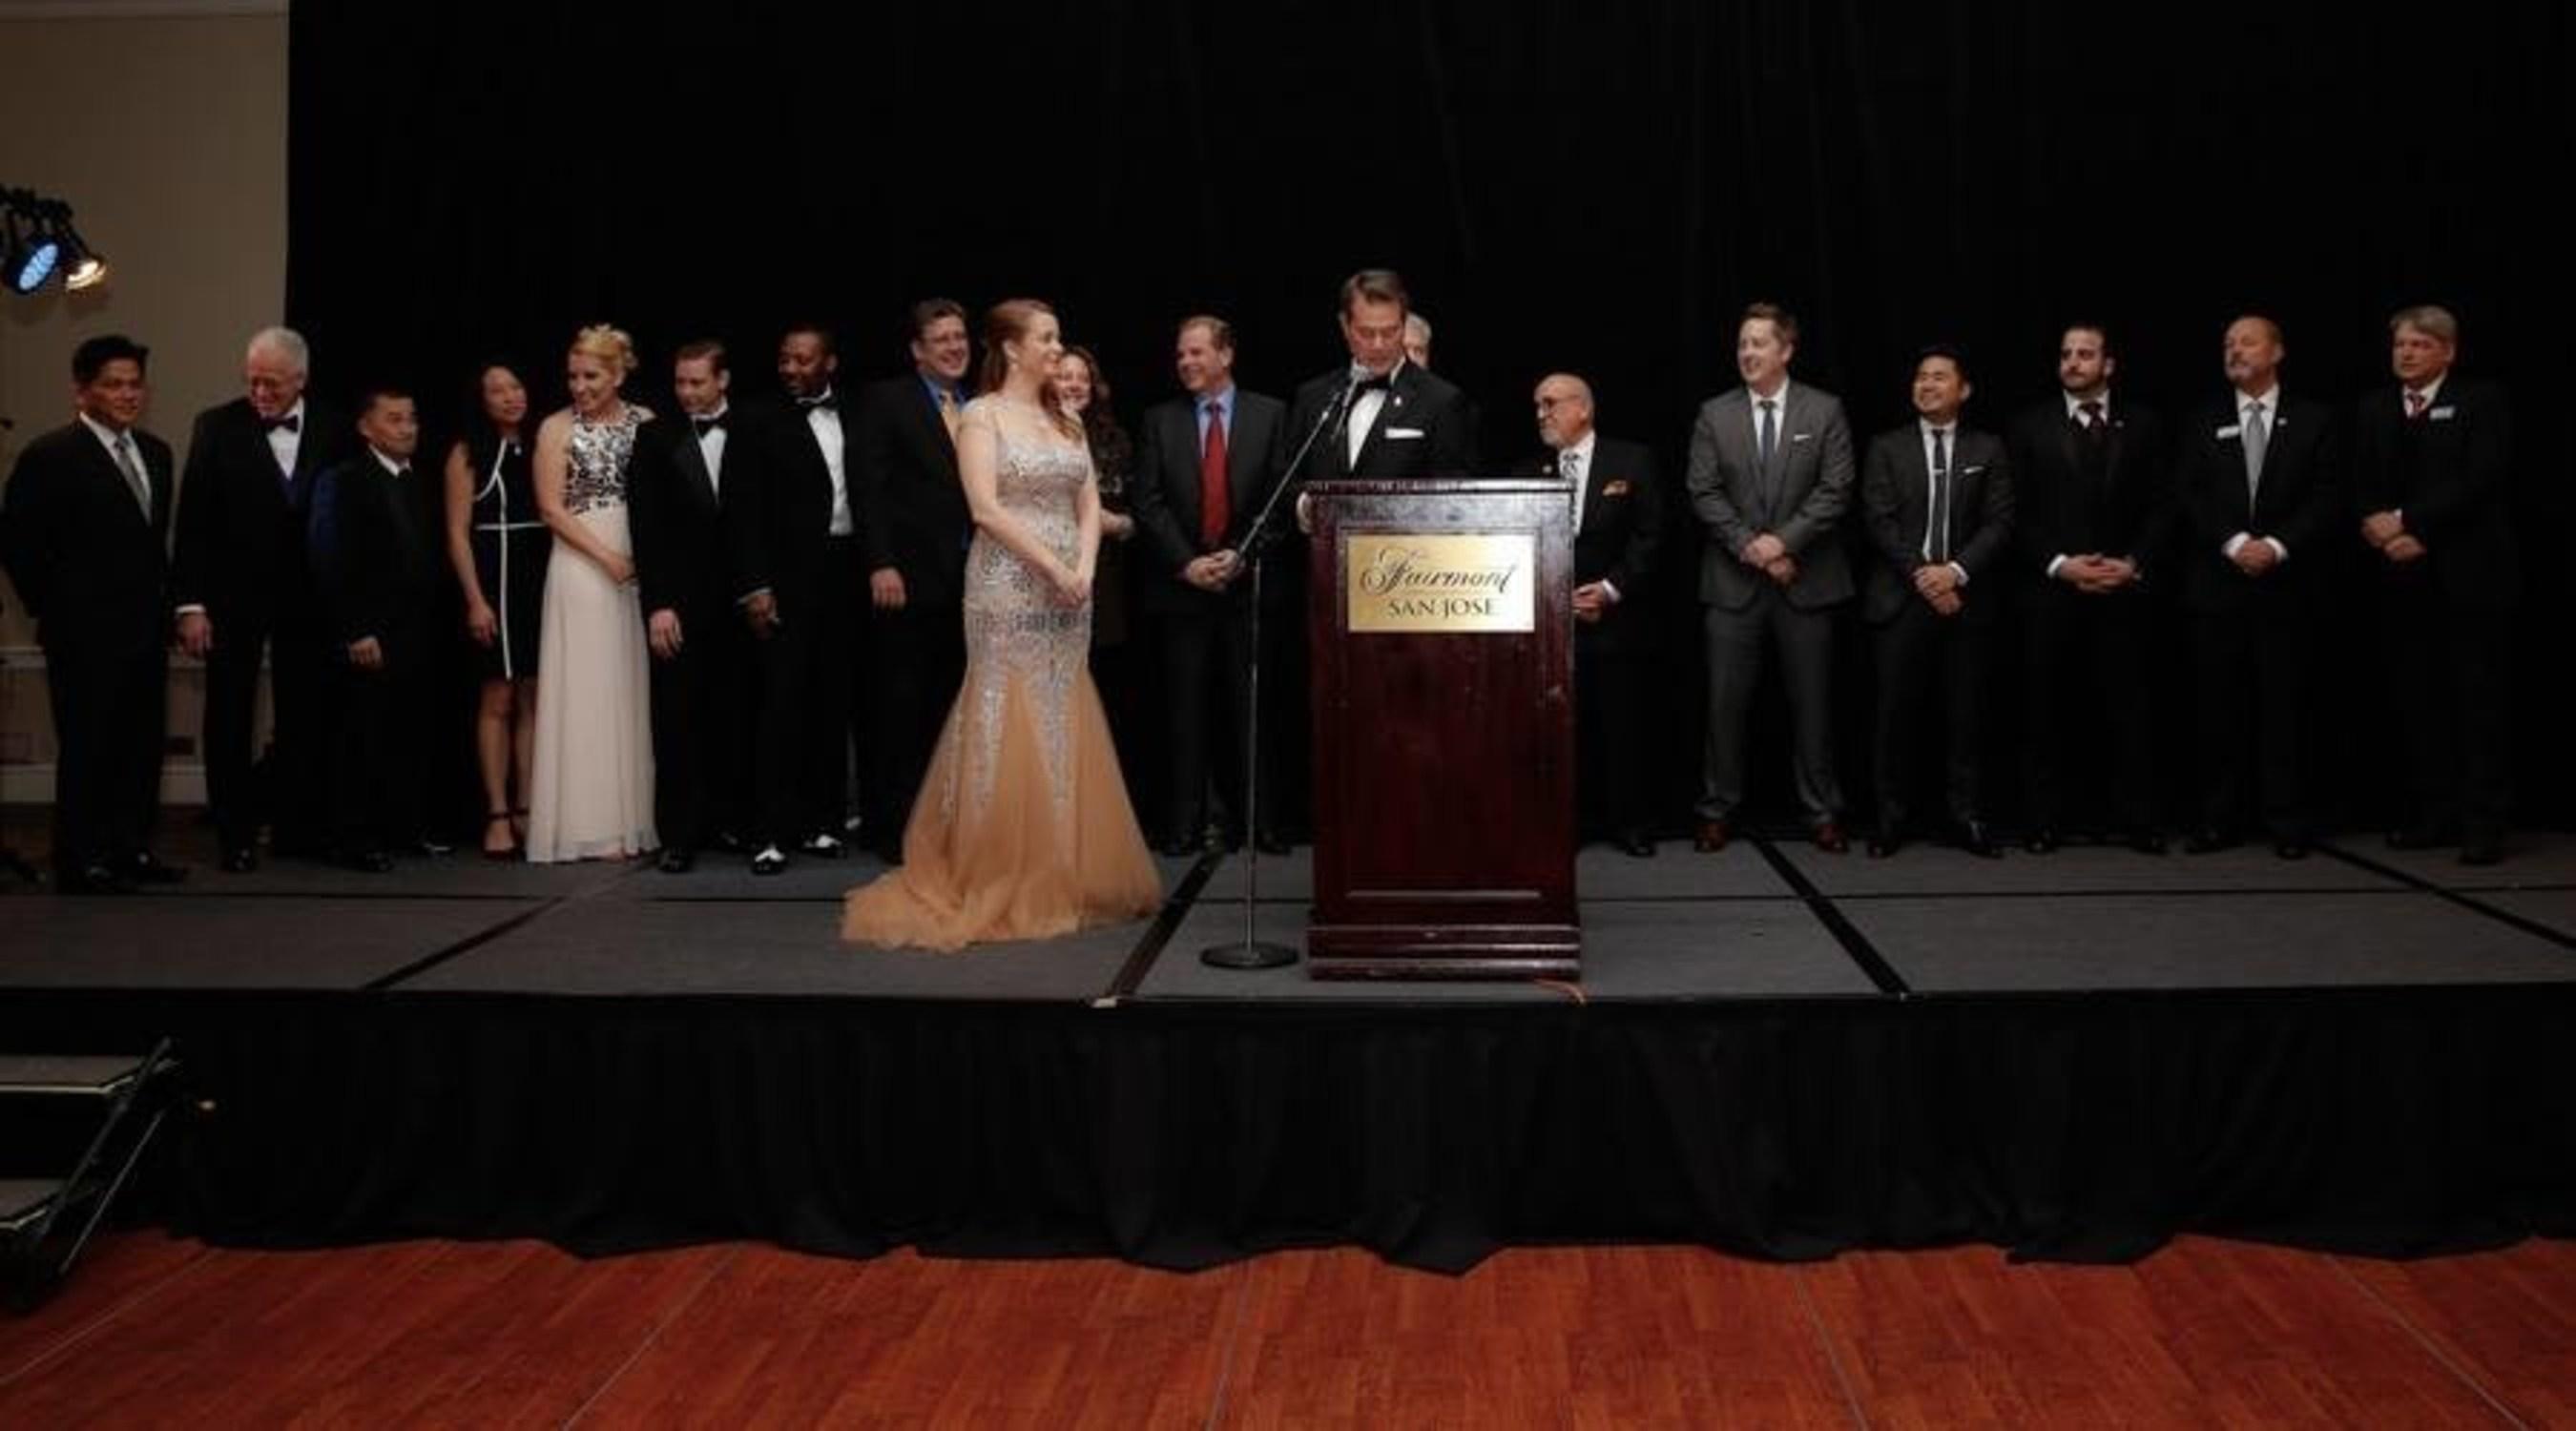 Santa Clara County Association of REALTORS' Celebrates 120th Anniversary, Installs 2016 Board of Directors